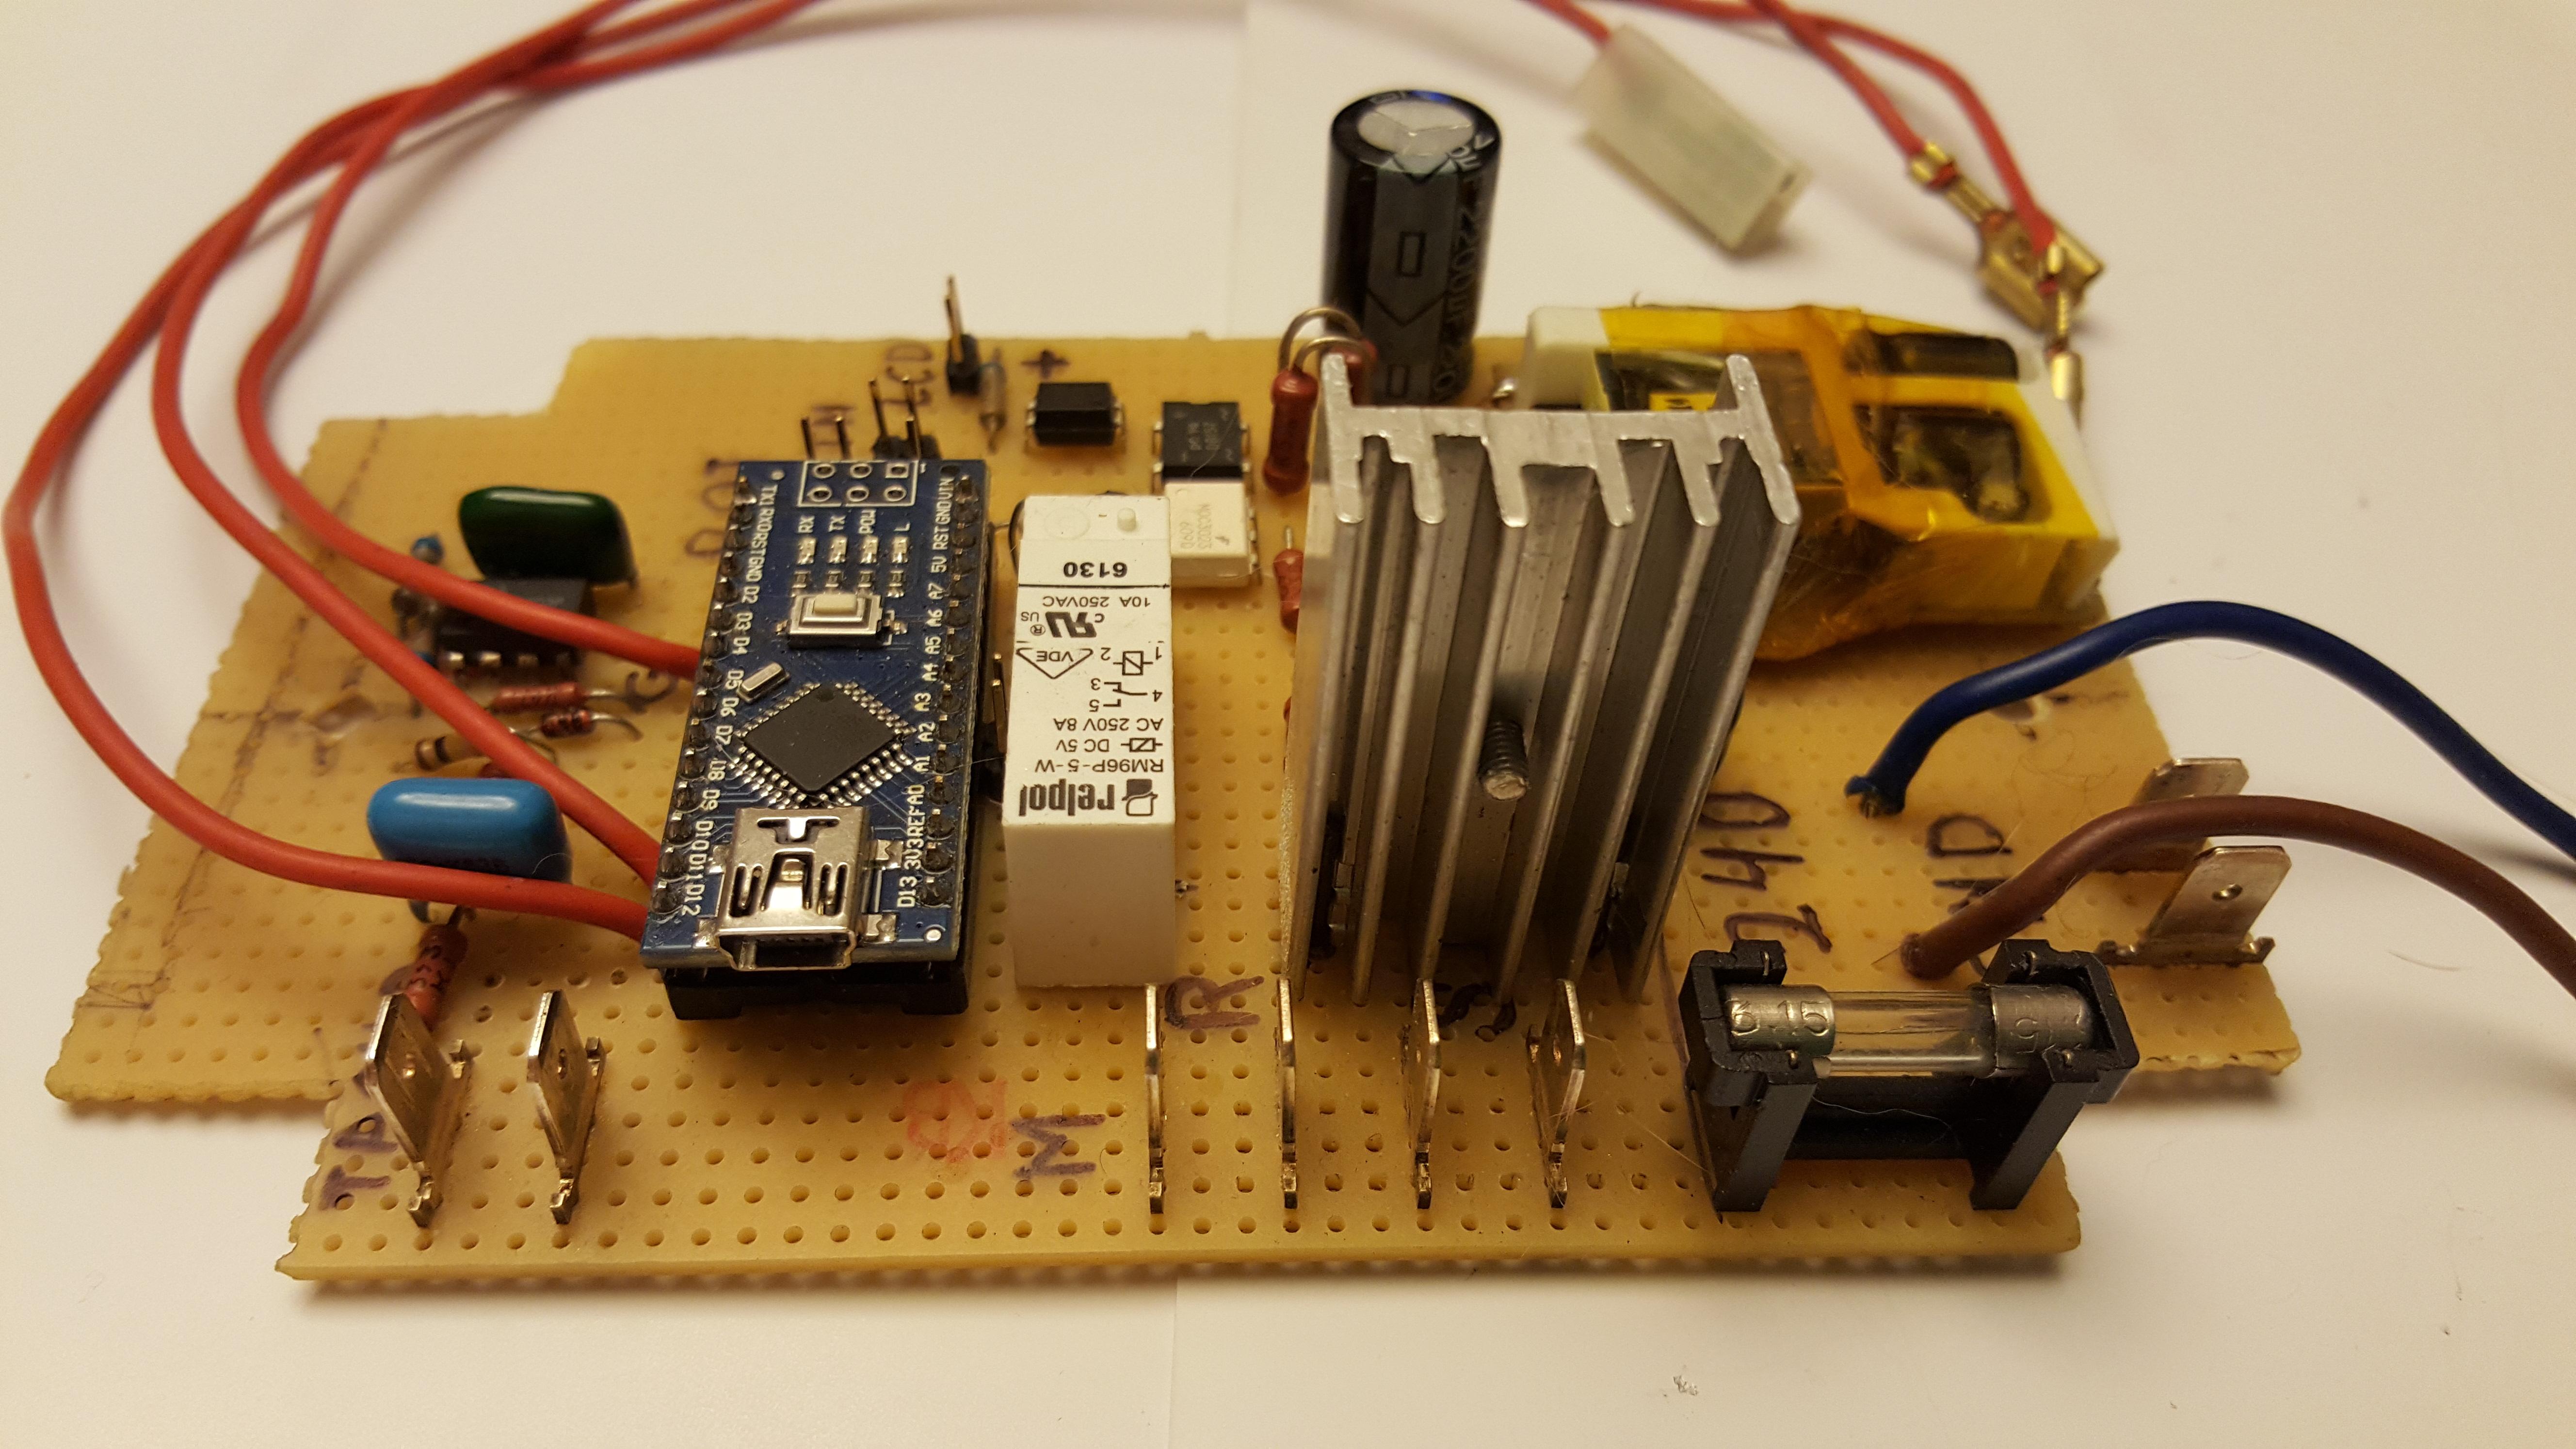 1156# 5A Range of Single-Phase AC Current Sensor Module for Arduino